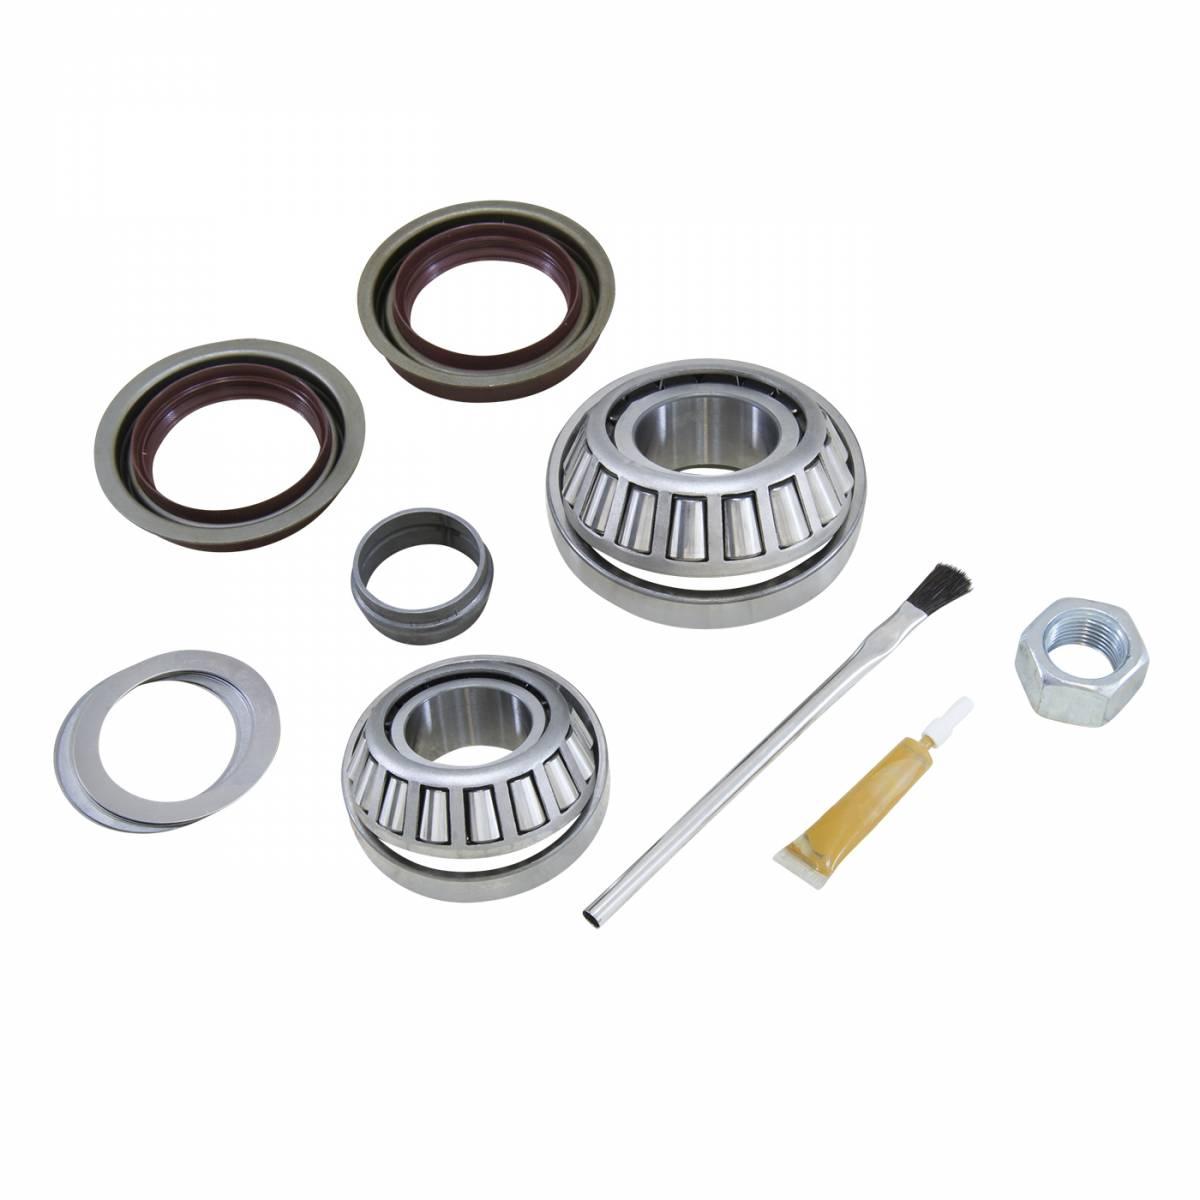 Yukon Gear Pk Gm8 6 B Pinion Install Kit